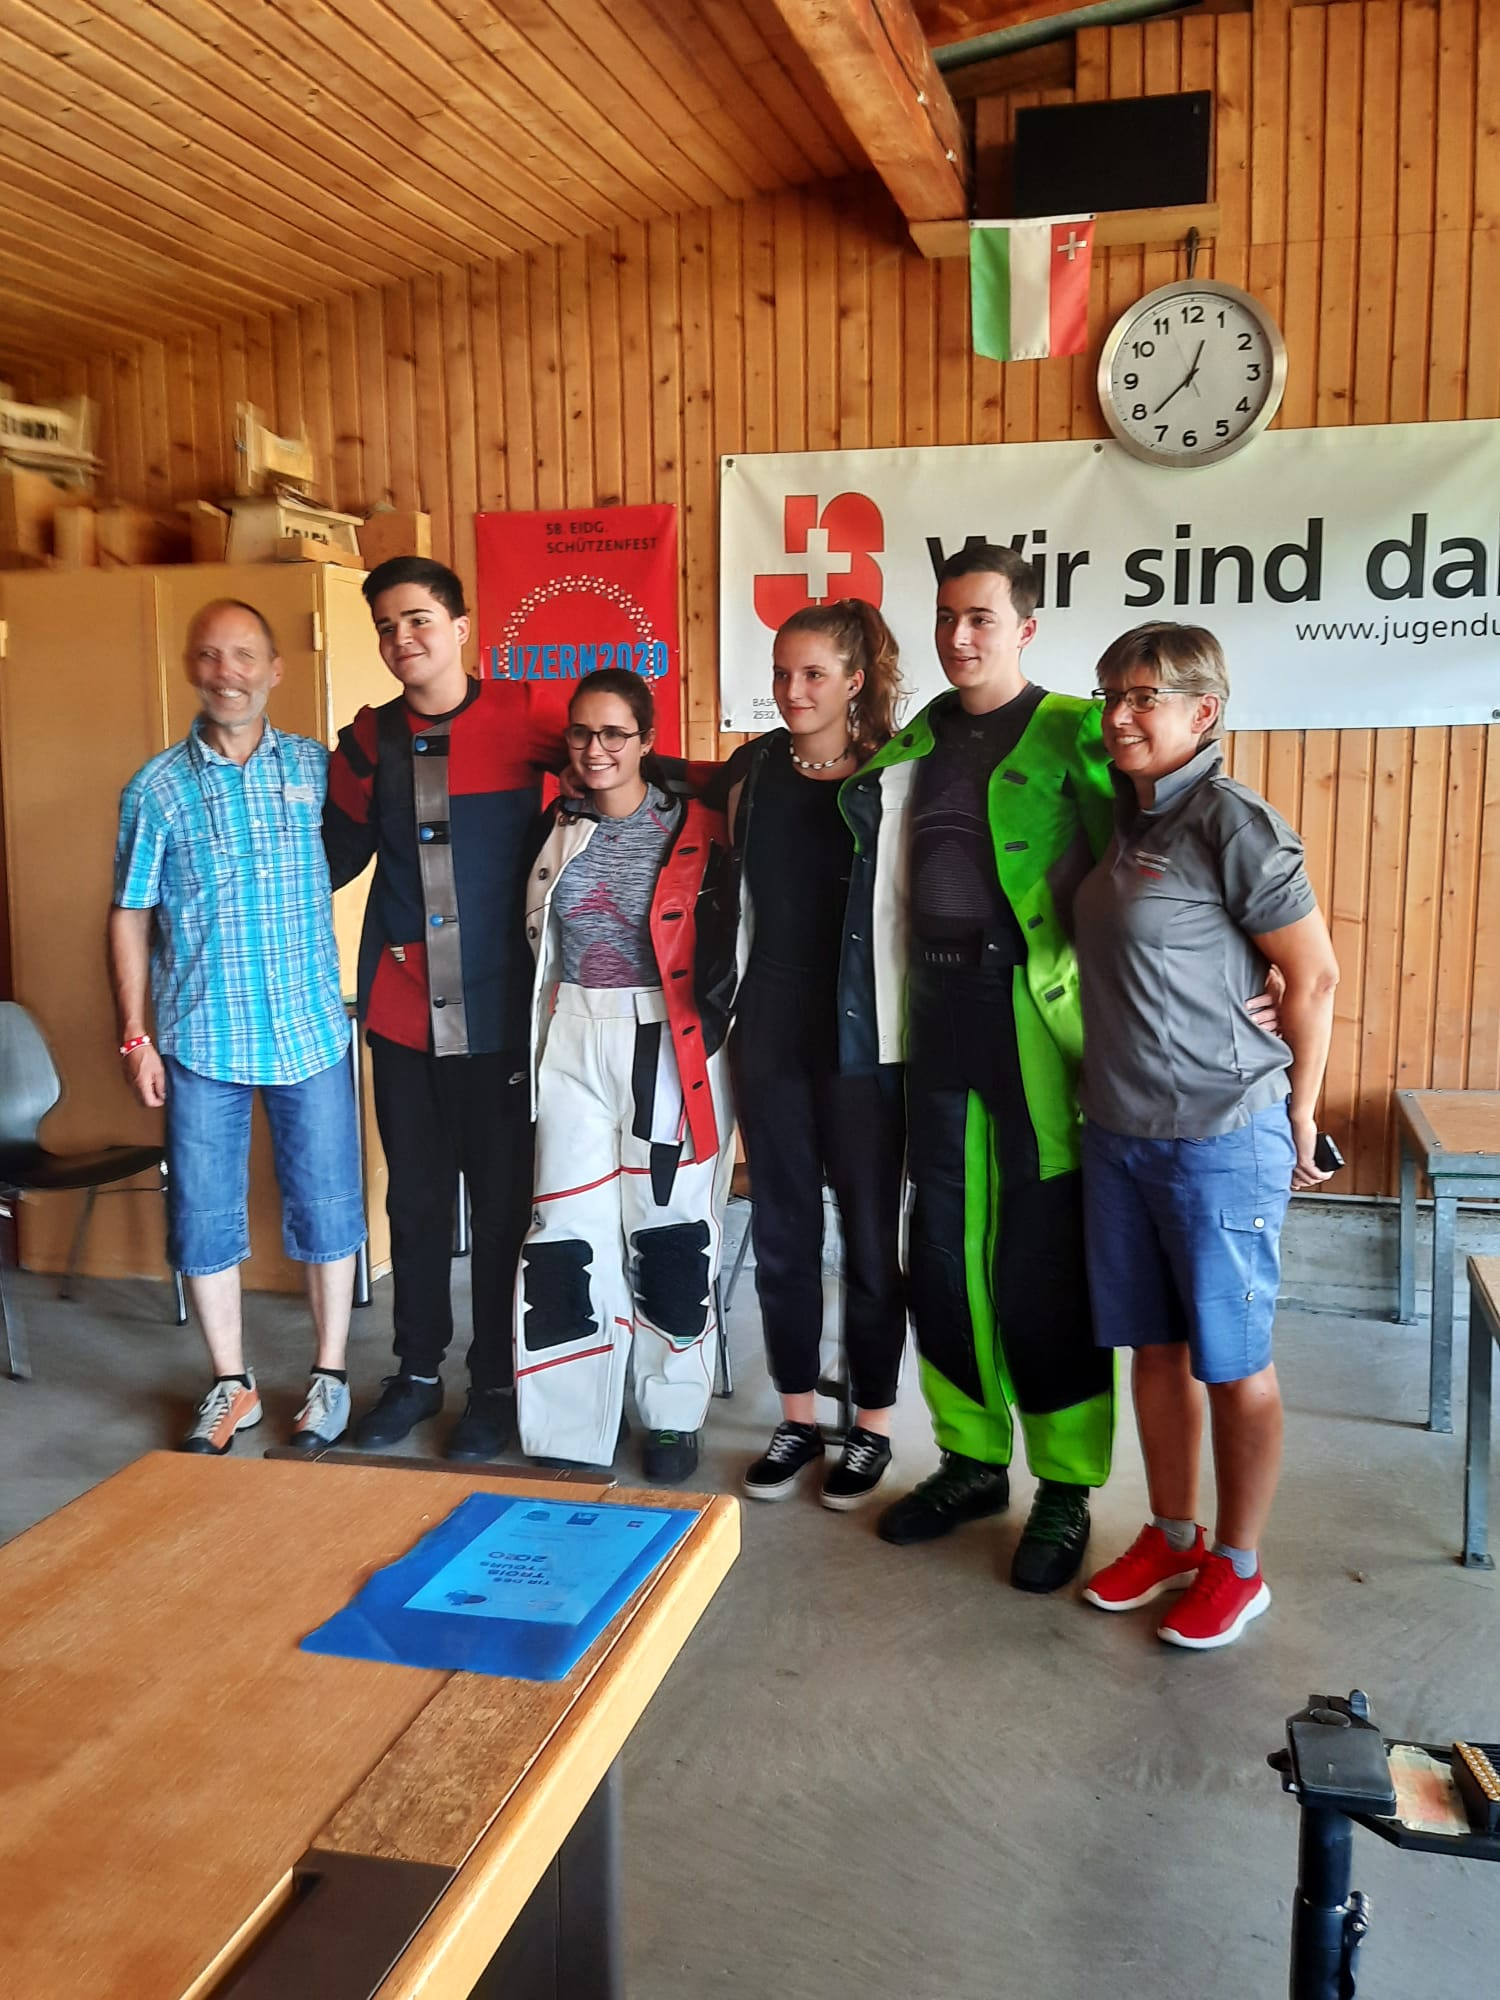 SGM Finale 2020 mit Sieger und Trainer v.l. Baseli * Tino * Annina * Anja * Chris * Yvonne